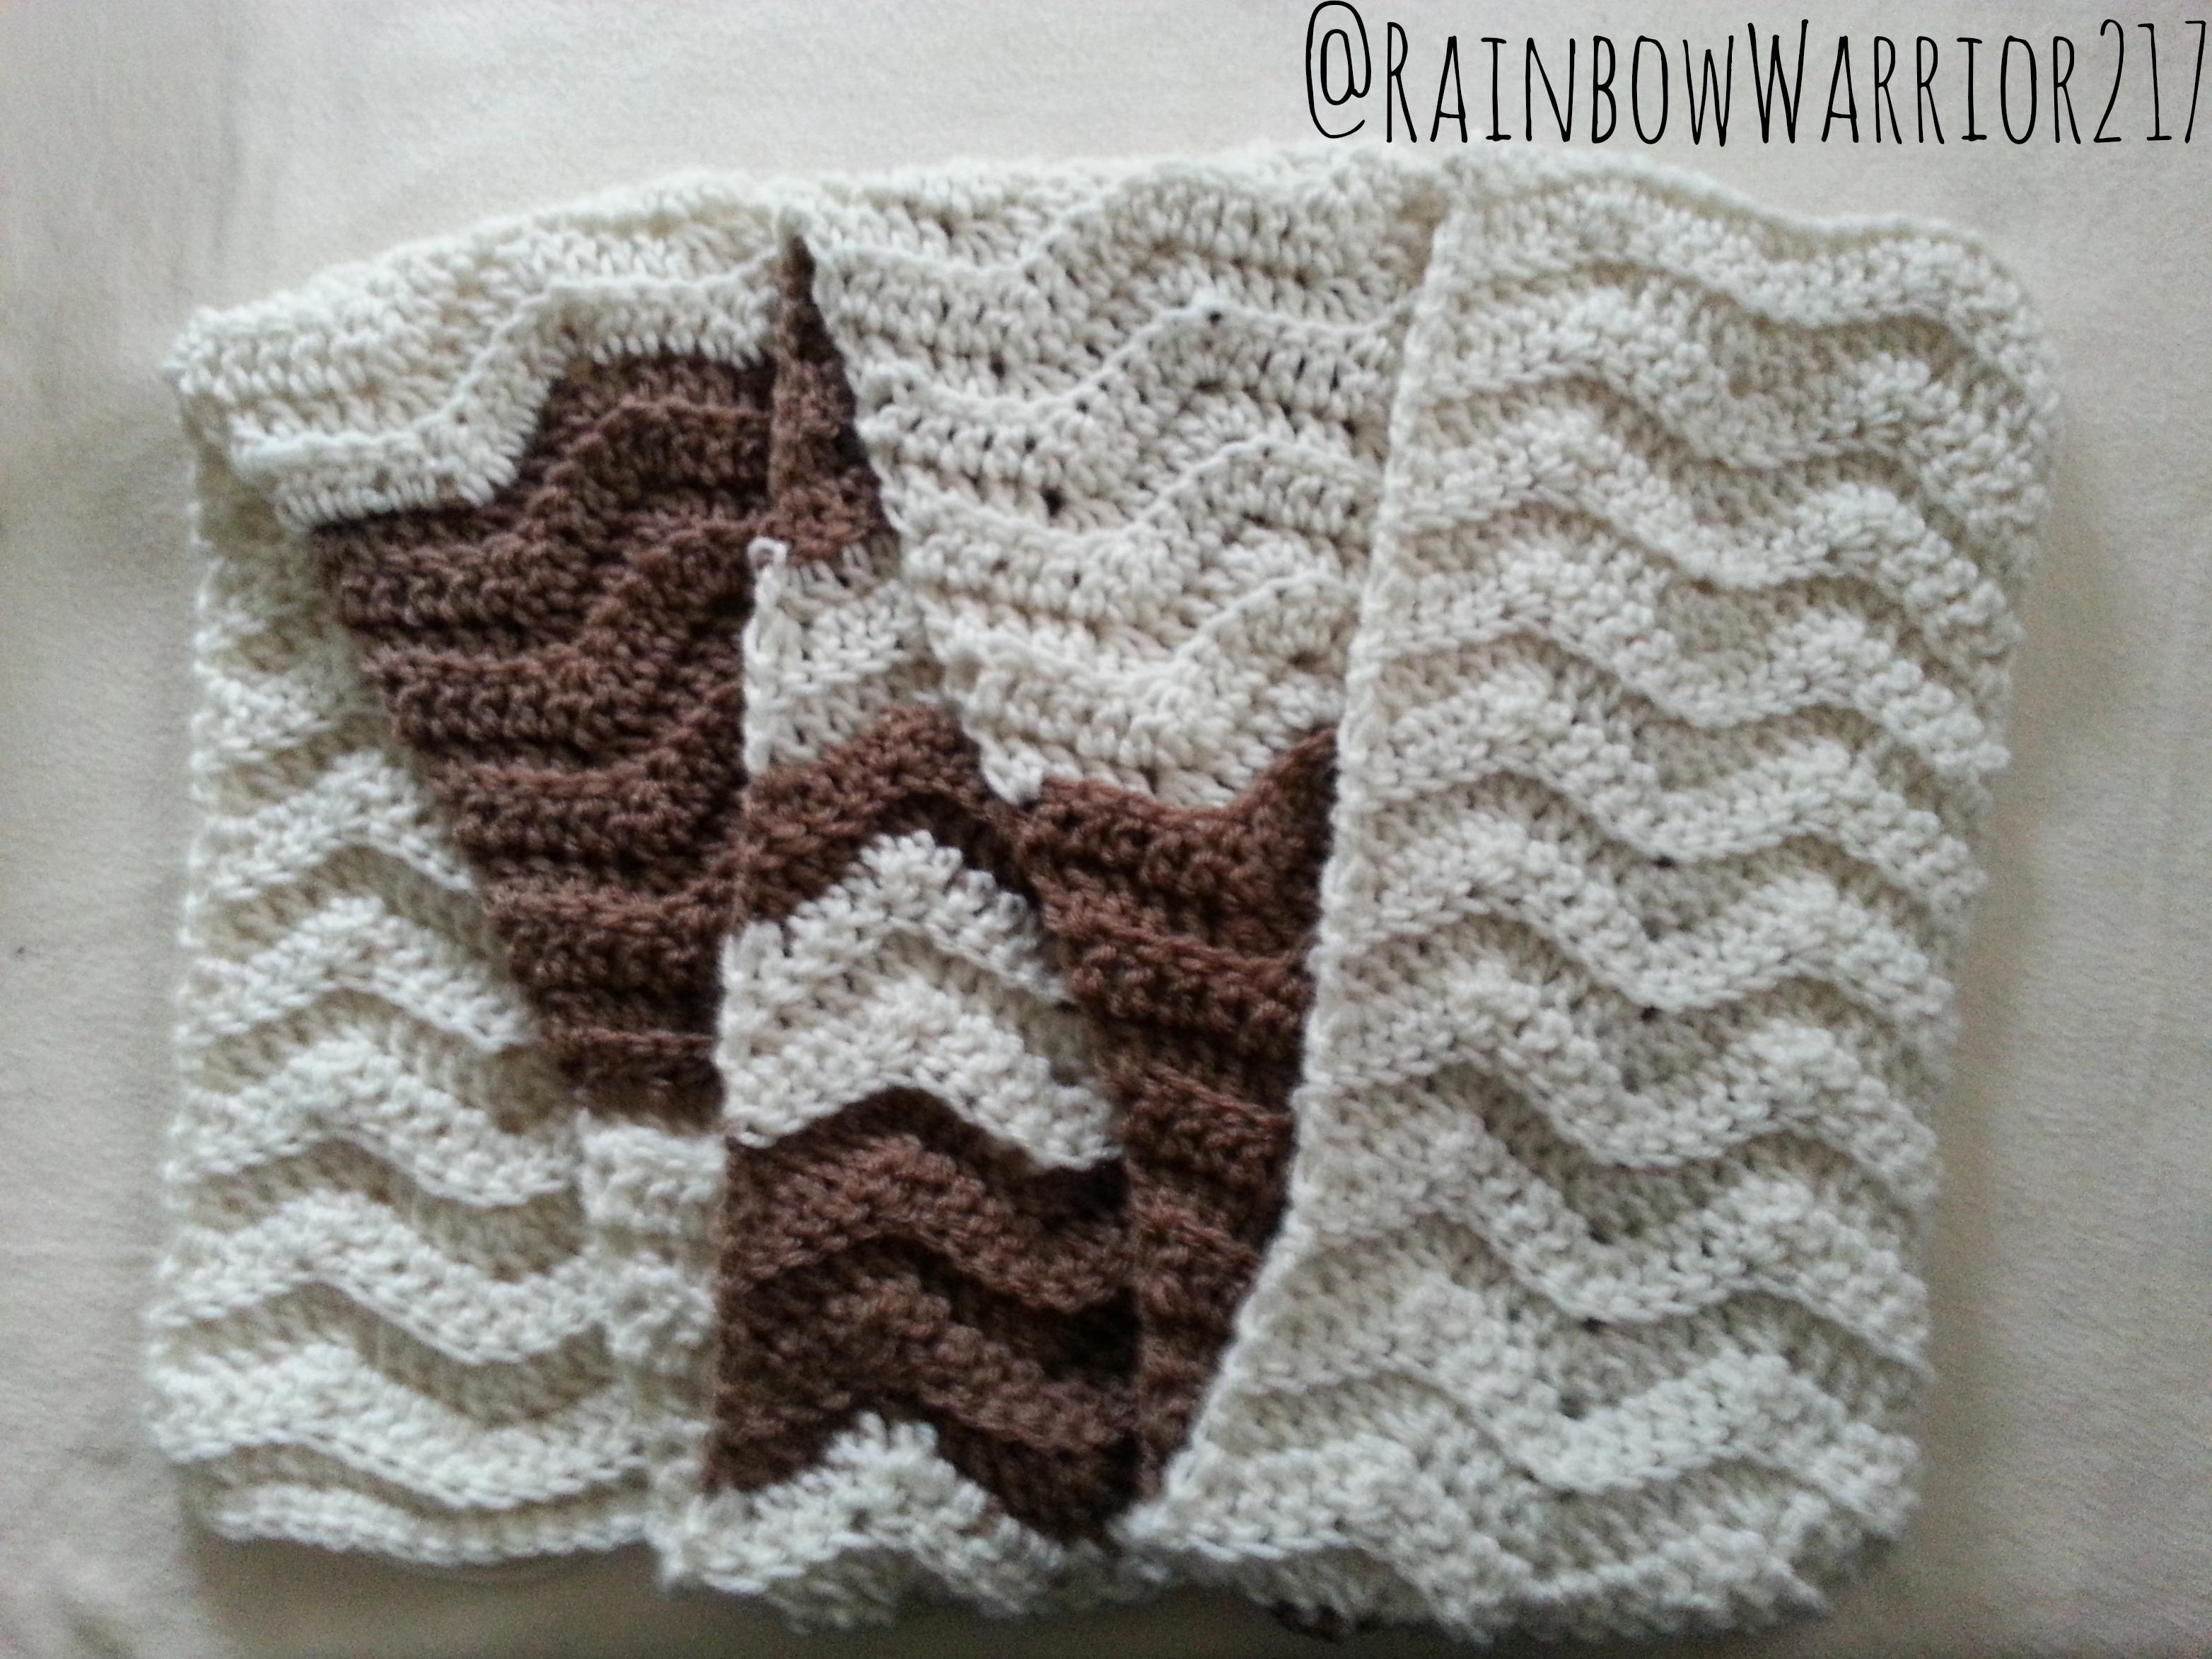 2 Tone Chevron Scarf Crochet Pattern Rainbow Warrior